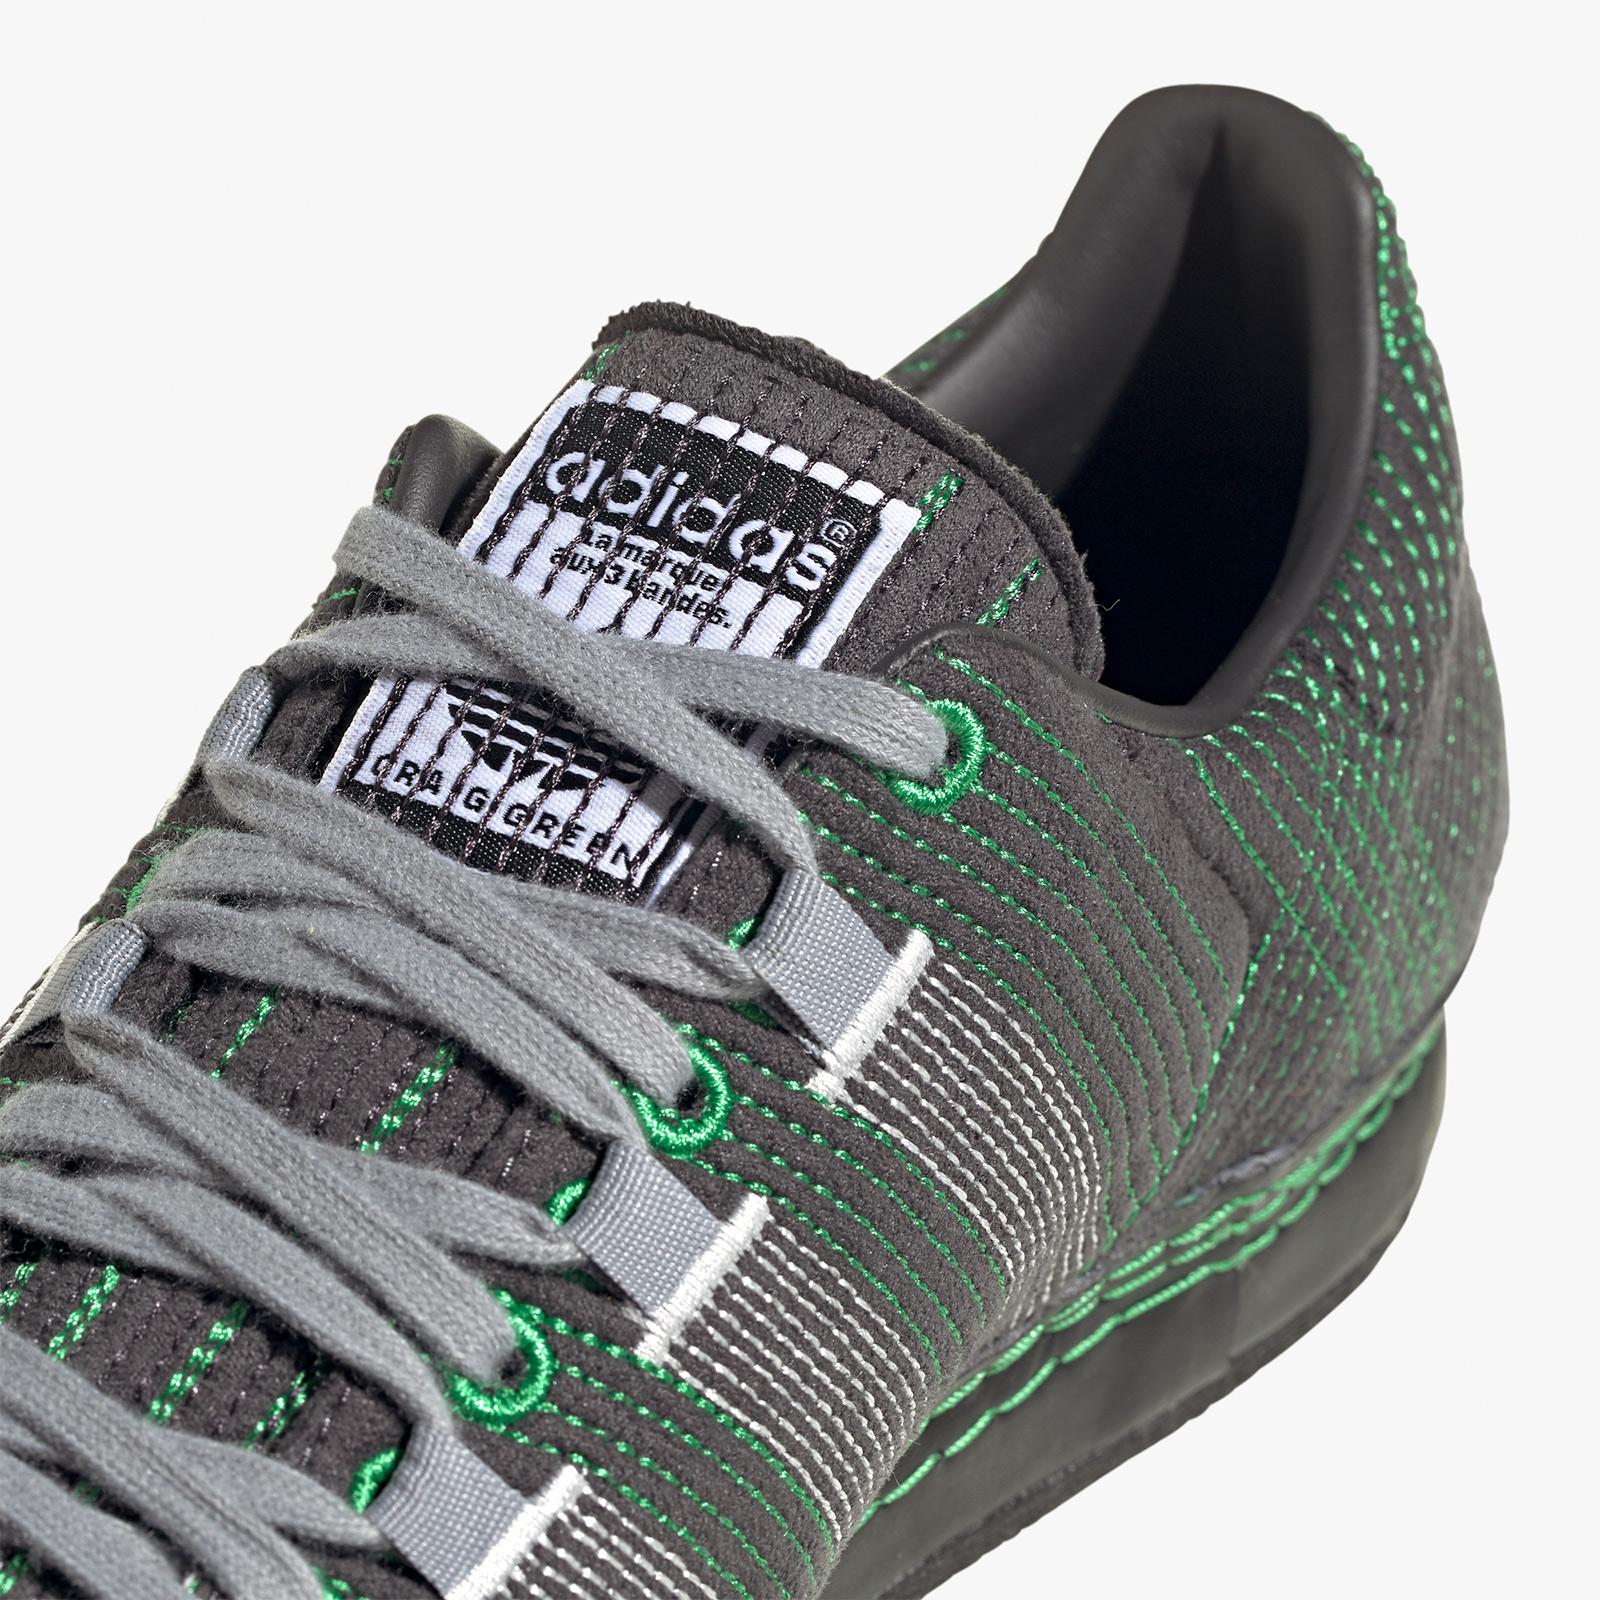 adidas Superstar x Craig Green - Fy5709 - SNS I Sneakers ...